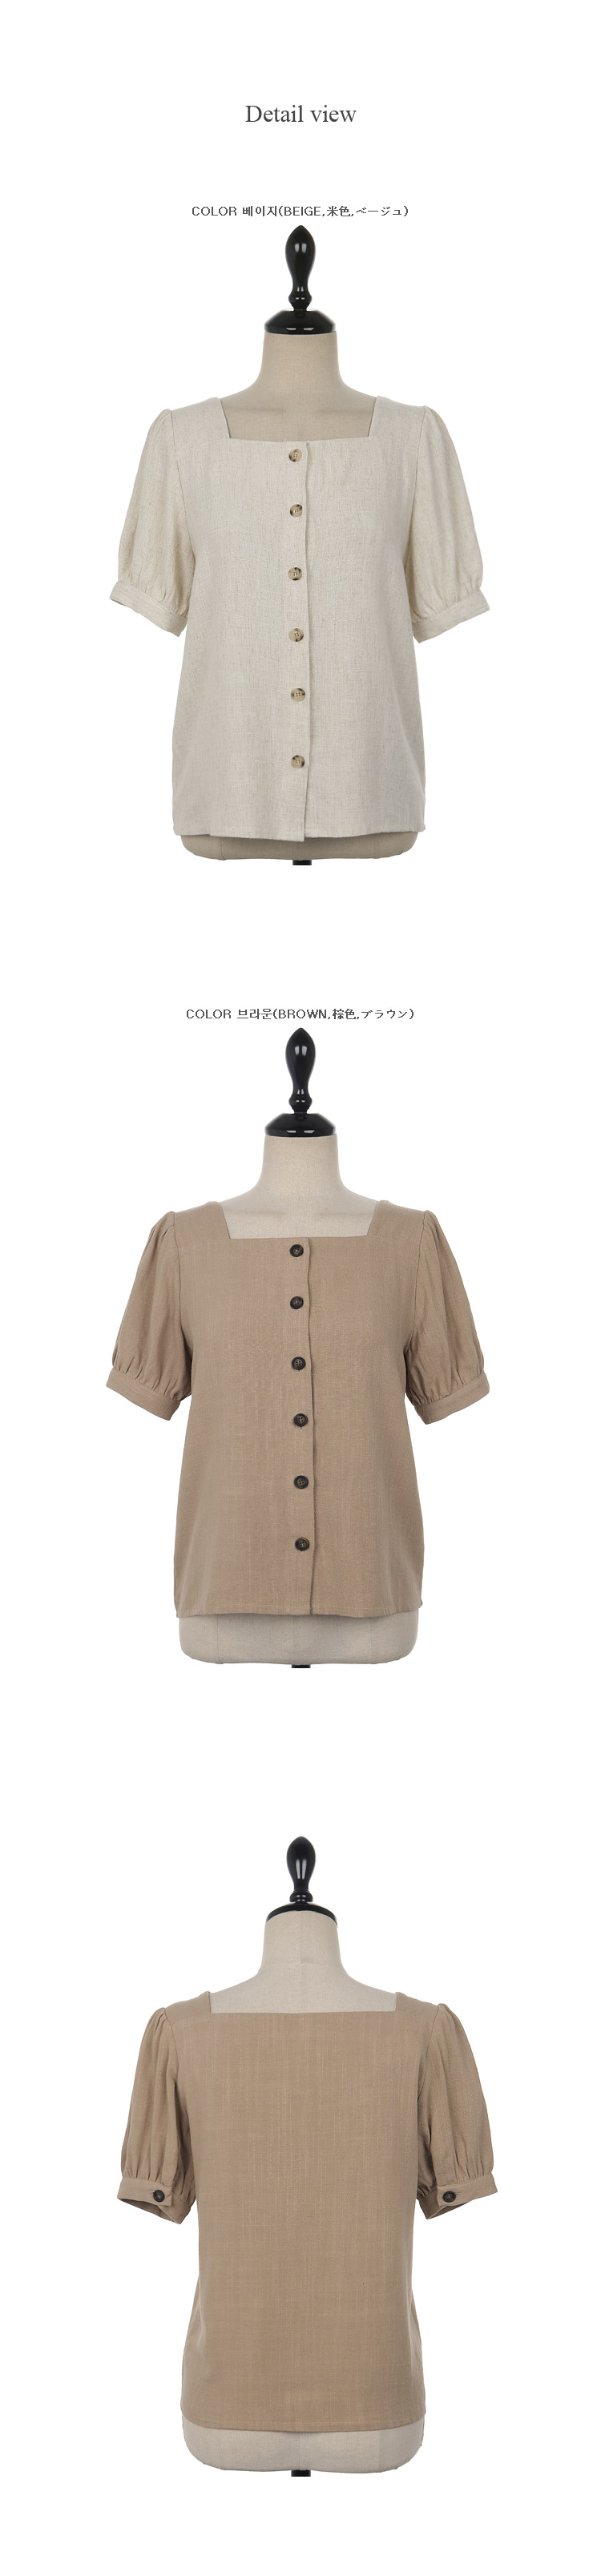 Linen square bl